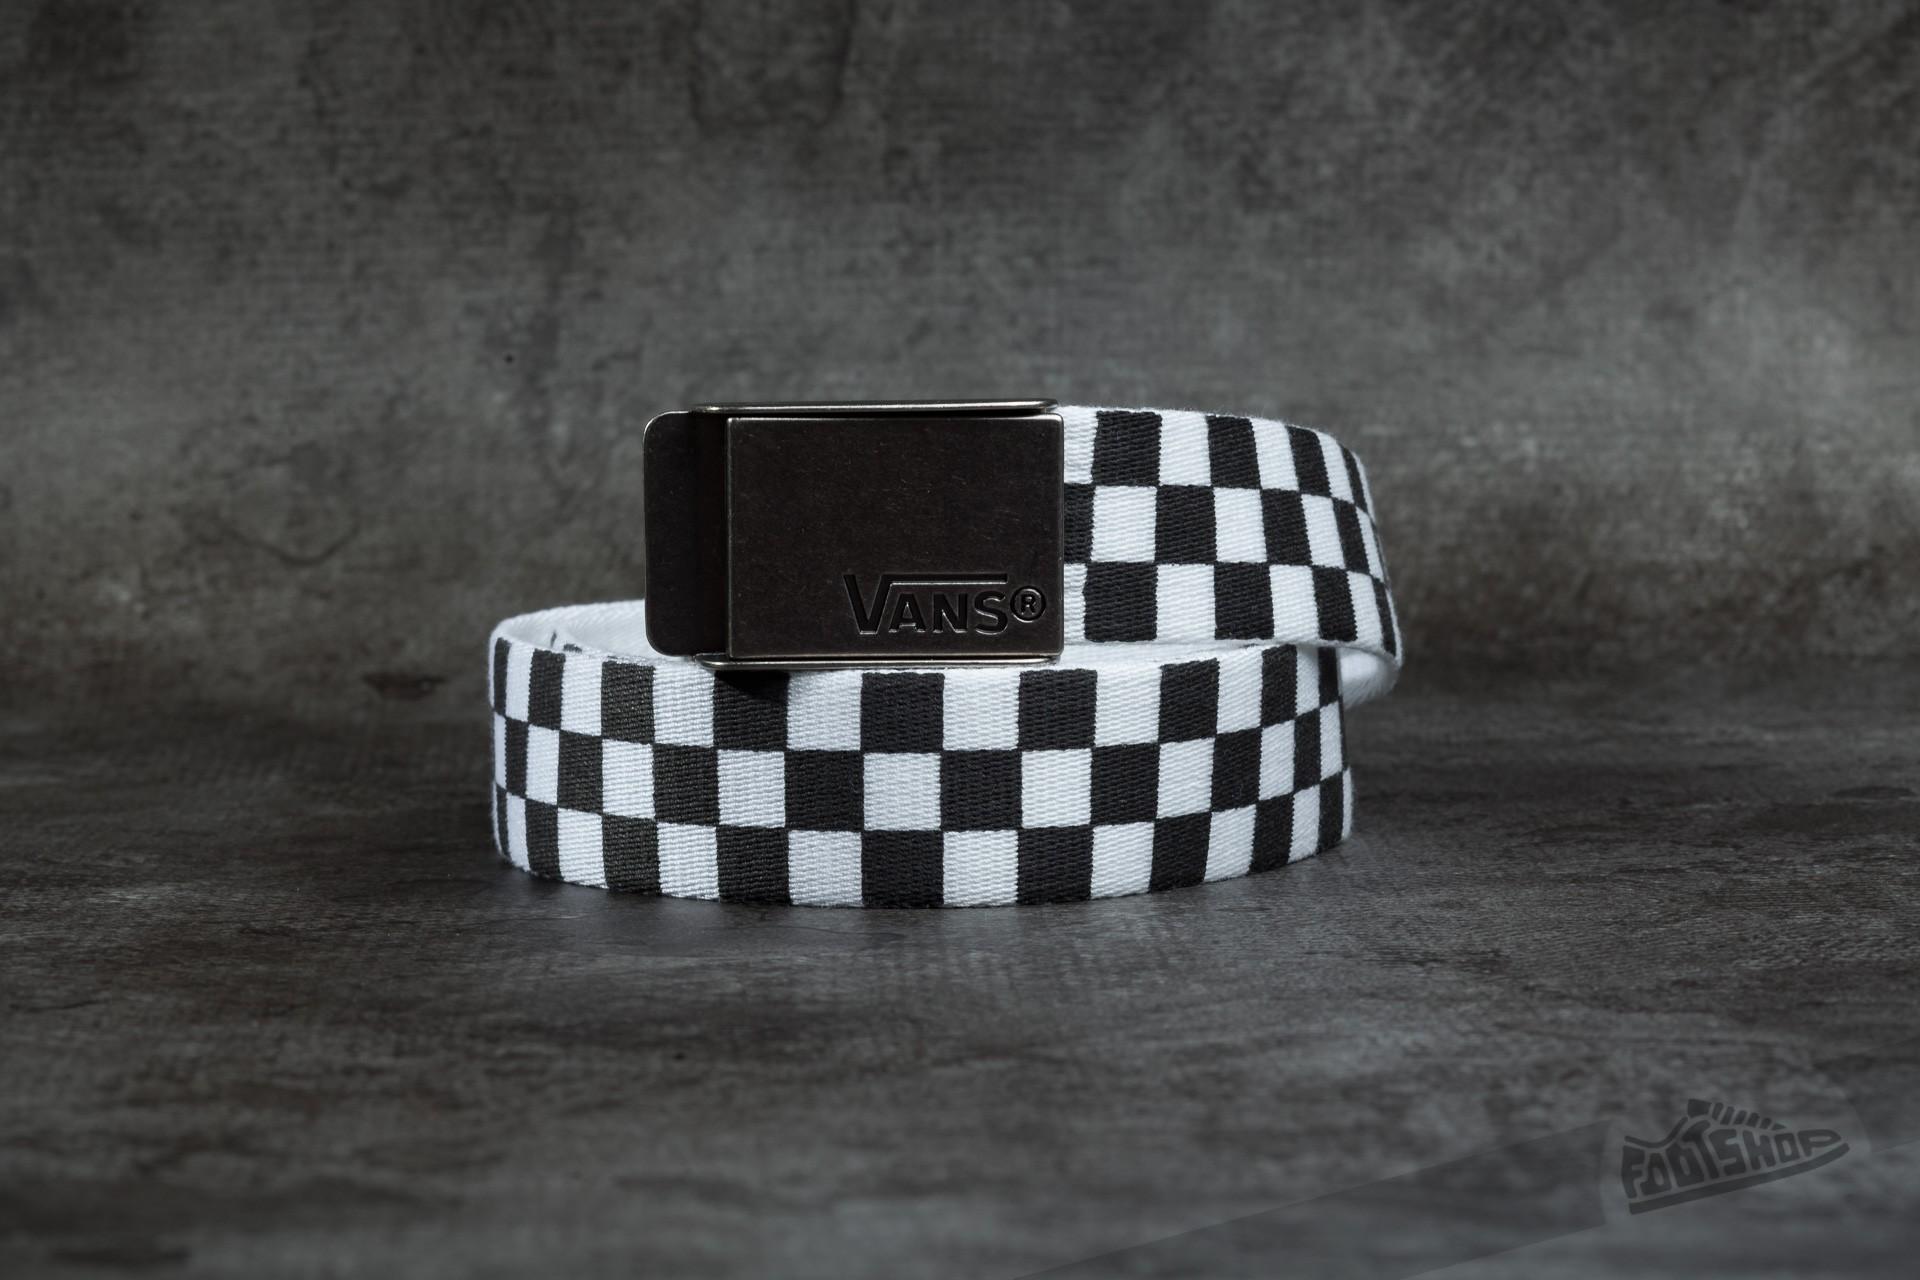 6b75fc7ae1f Vans Deppster Web Belt Black White